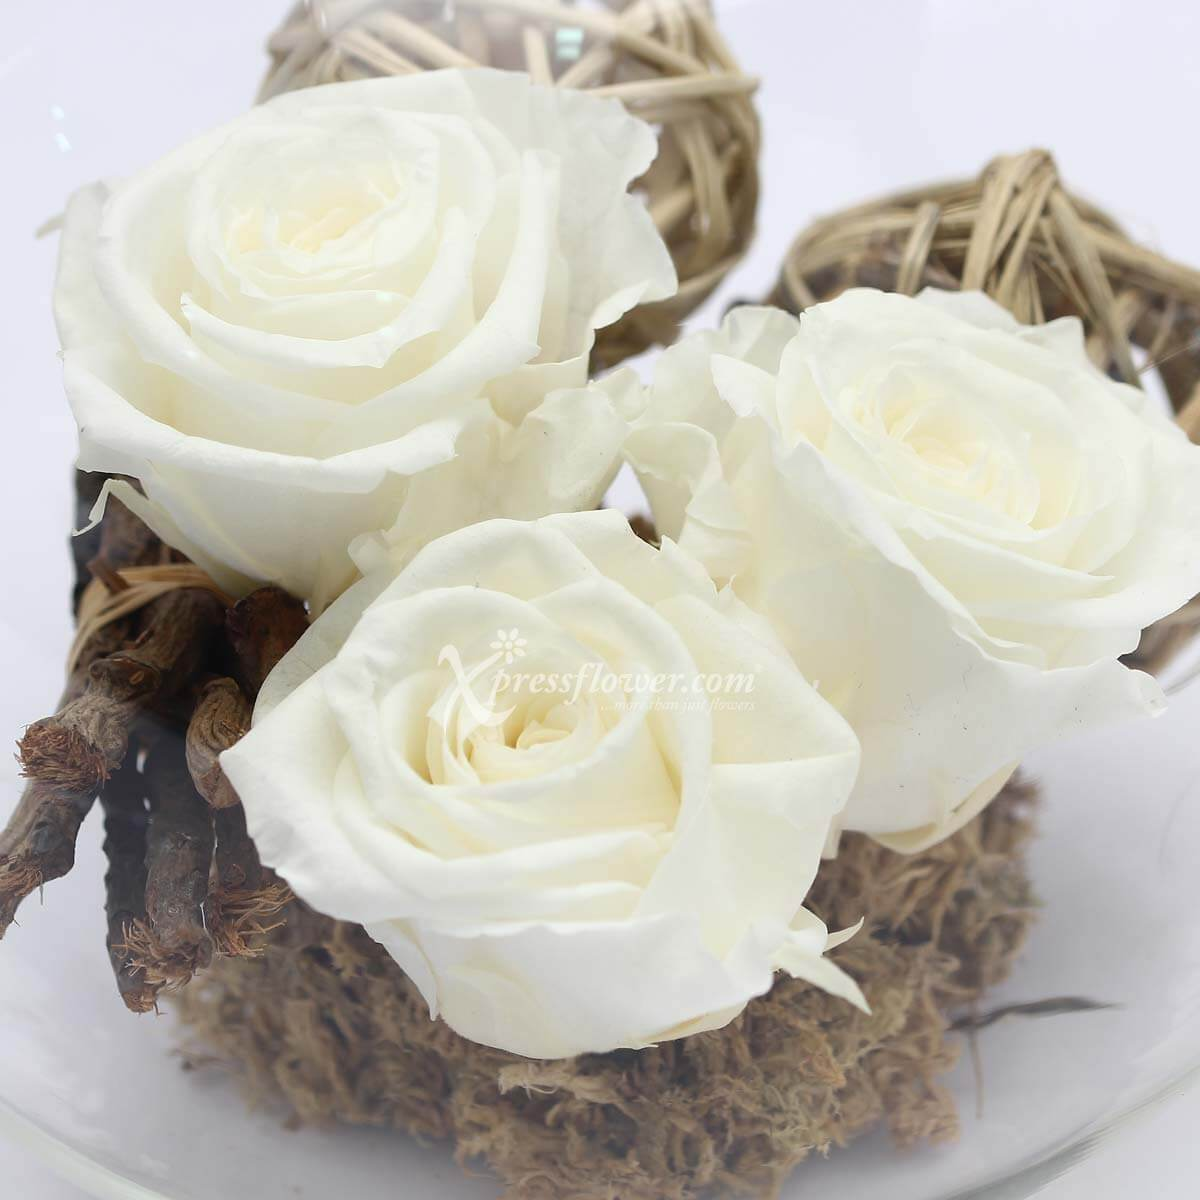 Valentine's Gift for Wife - Girlfriend - Moonlight Rose